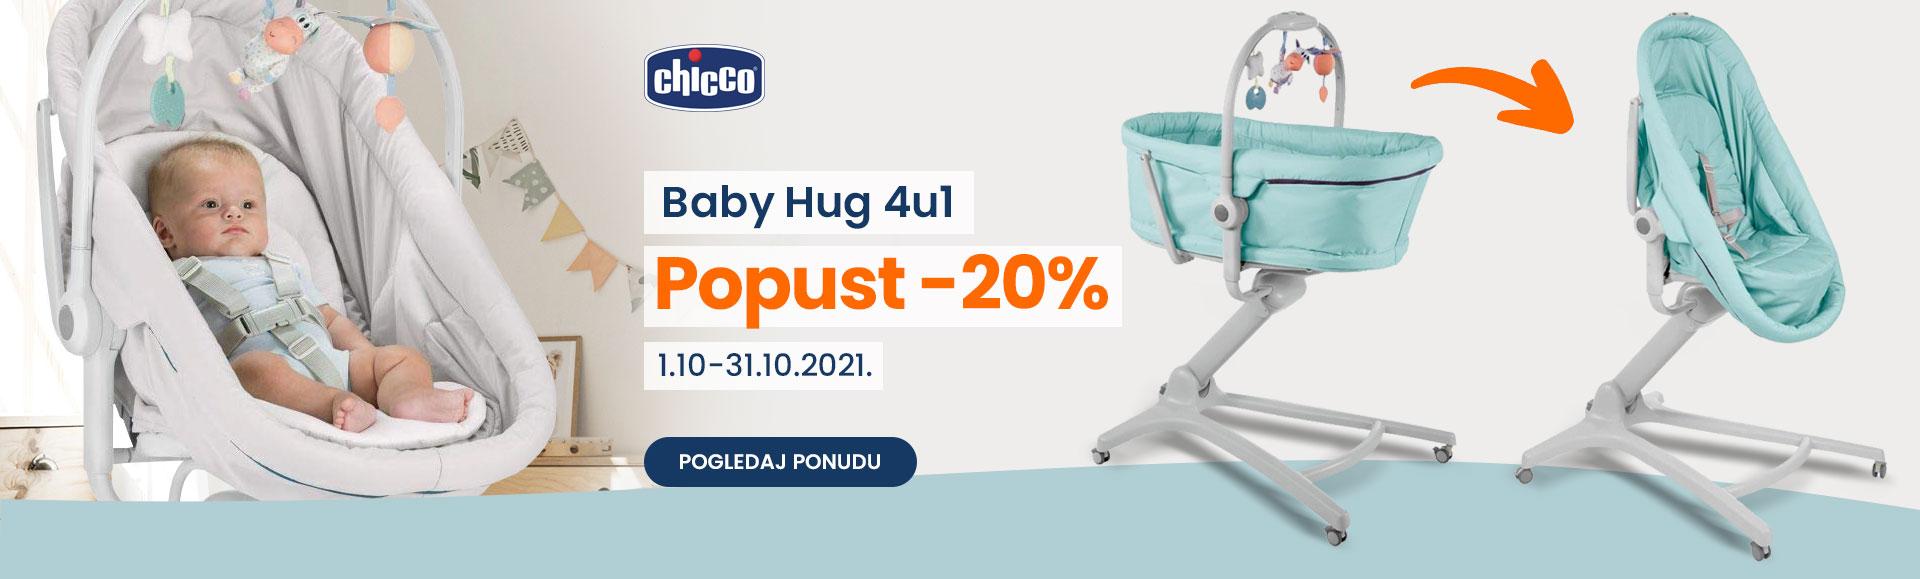 Chicco akcija baby Hug oktobar